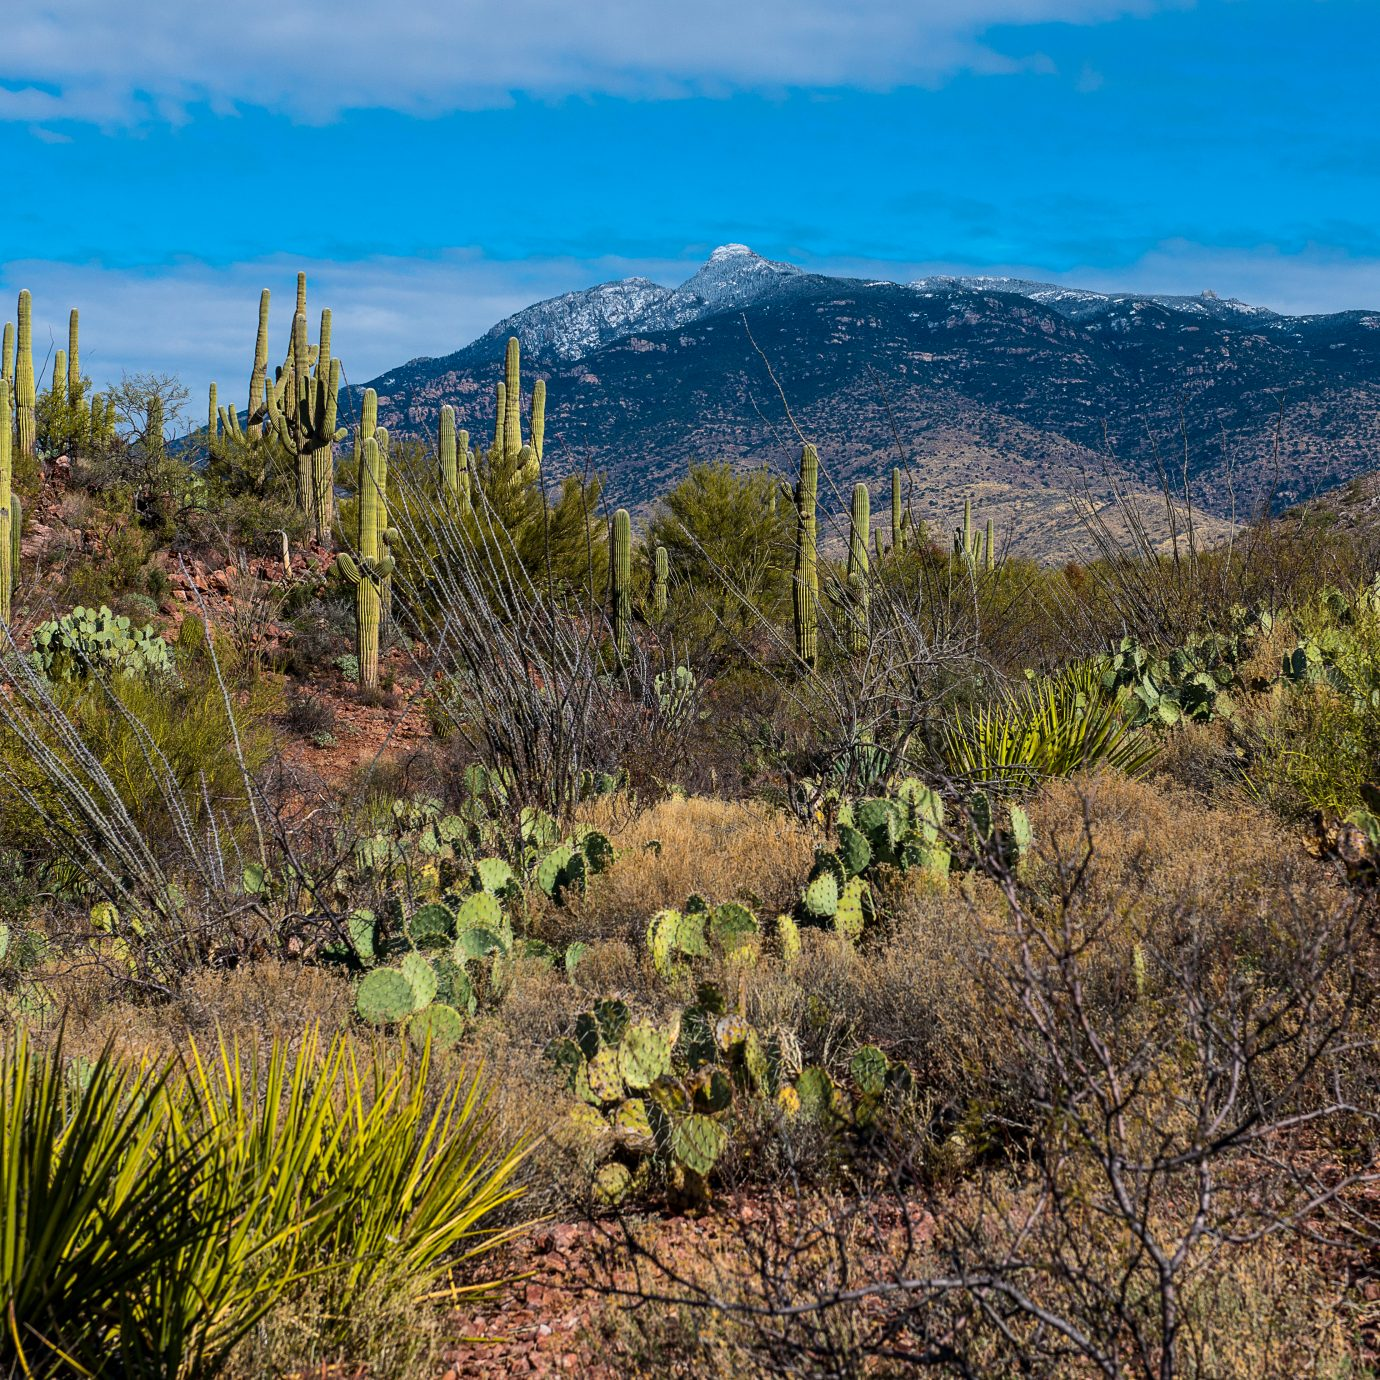 The Desert southwest in Arizona